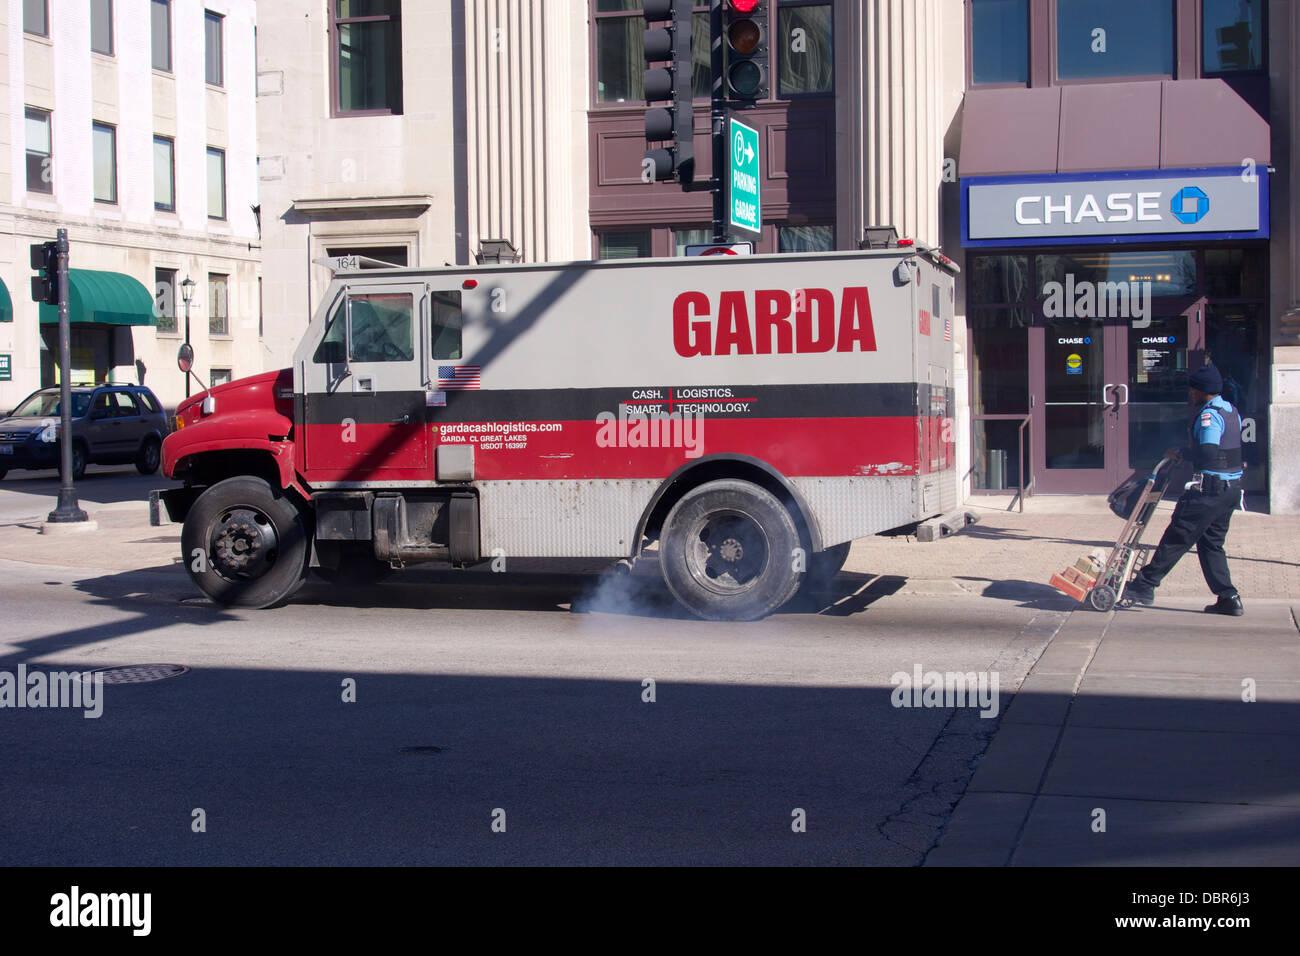 Garda armored truck Stock Photo, Royalty Free Image: 61251293 - Alamy